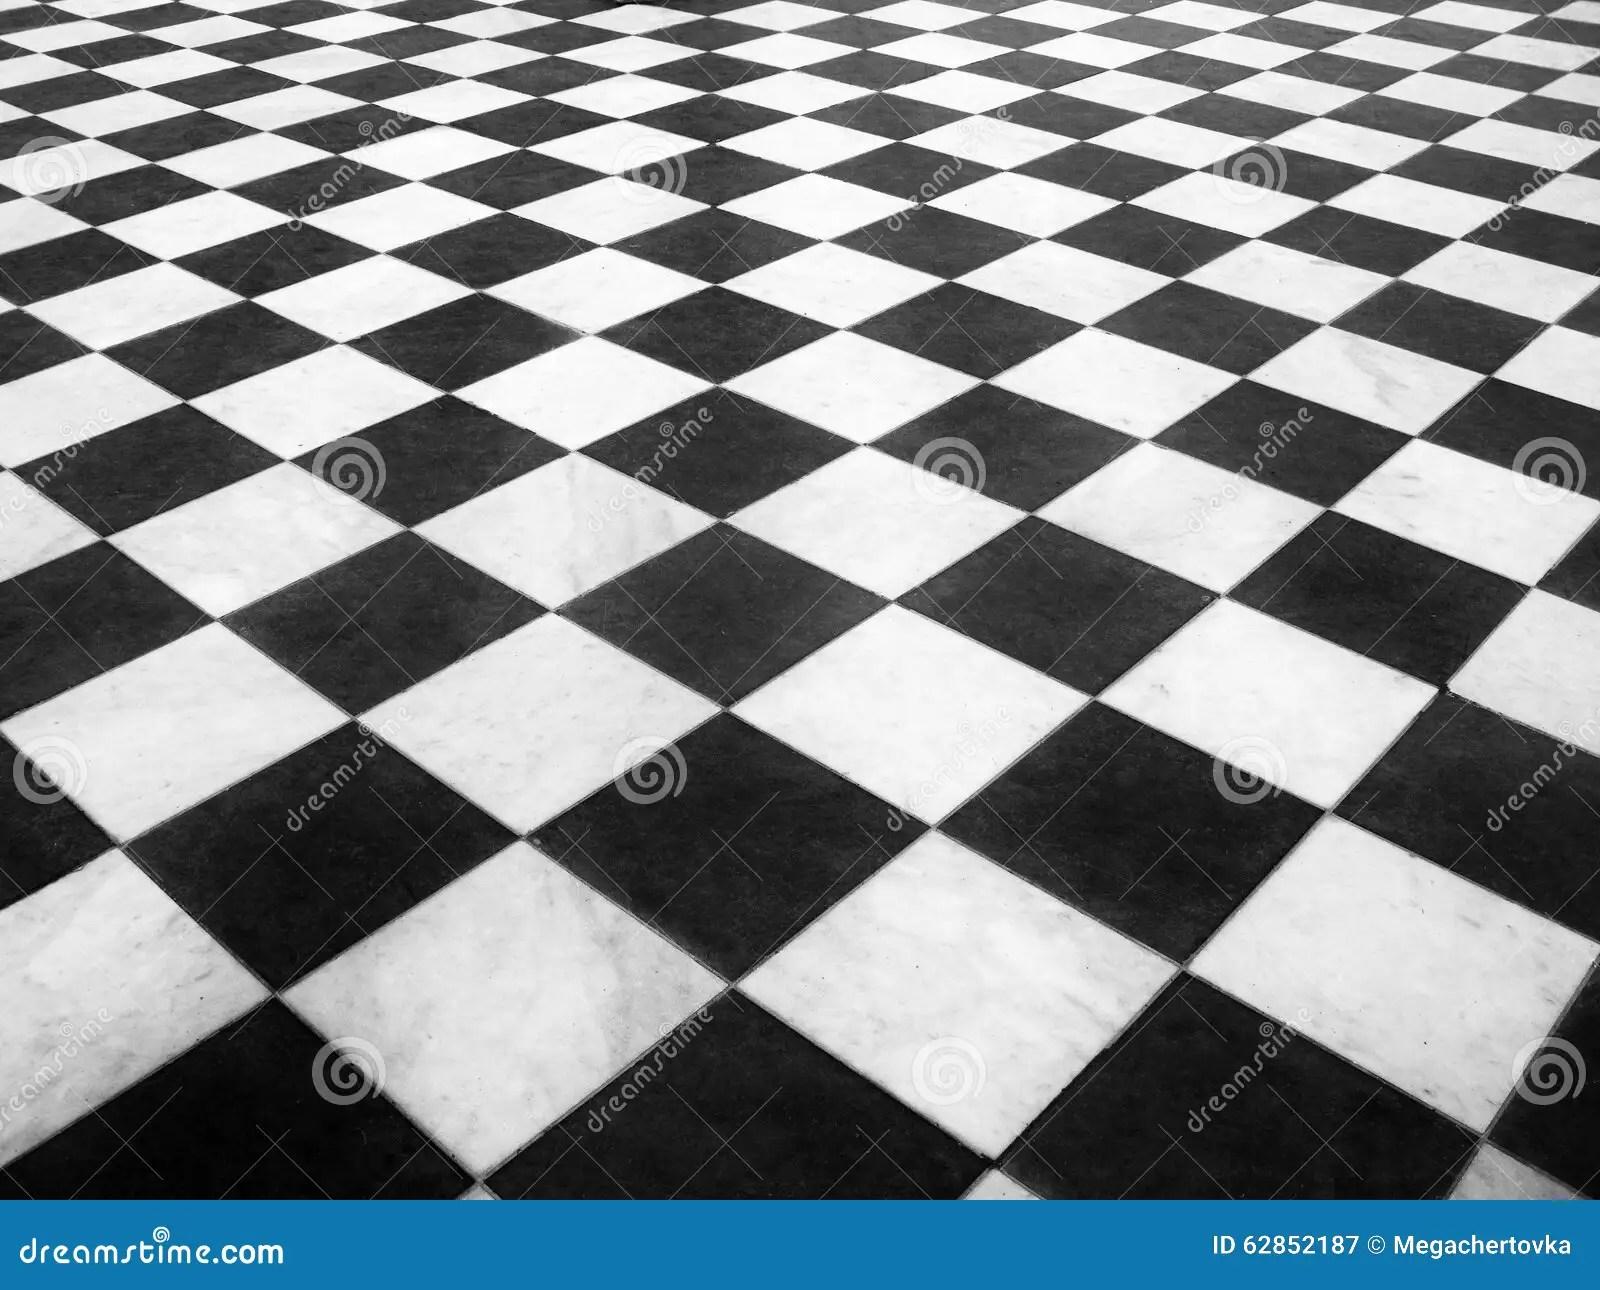 Chess marble floor stock image. Image of classic, nobody